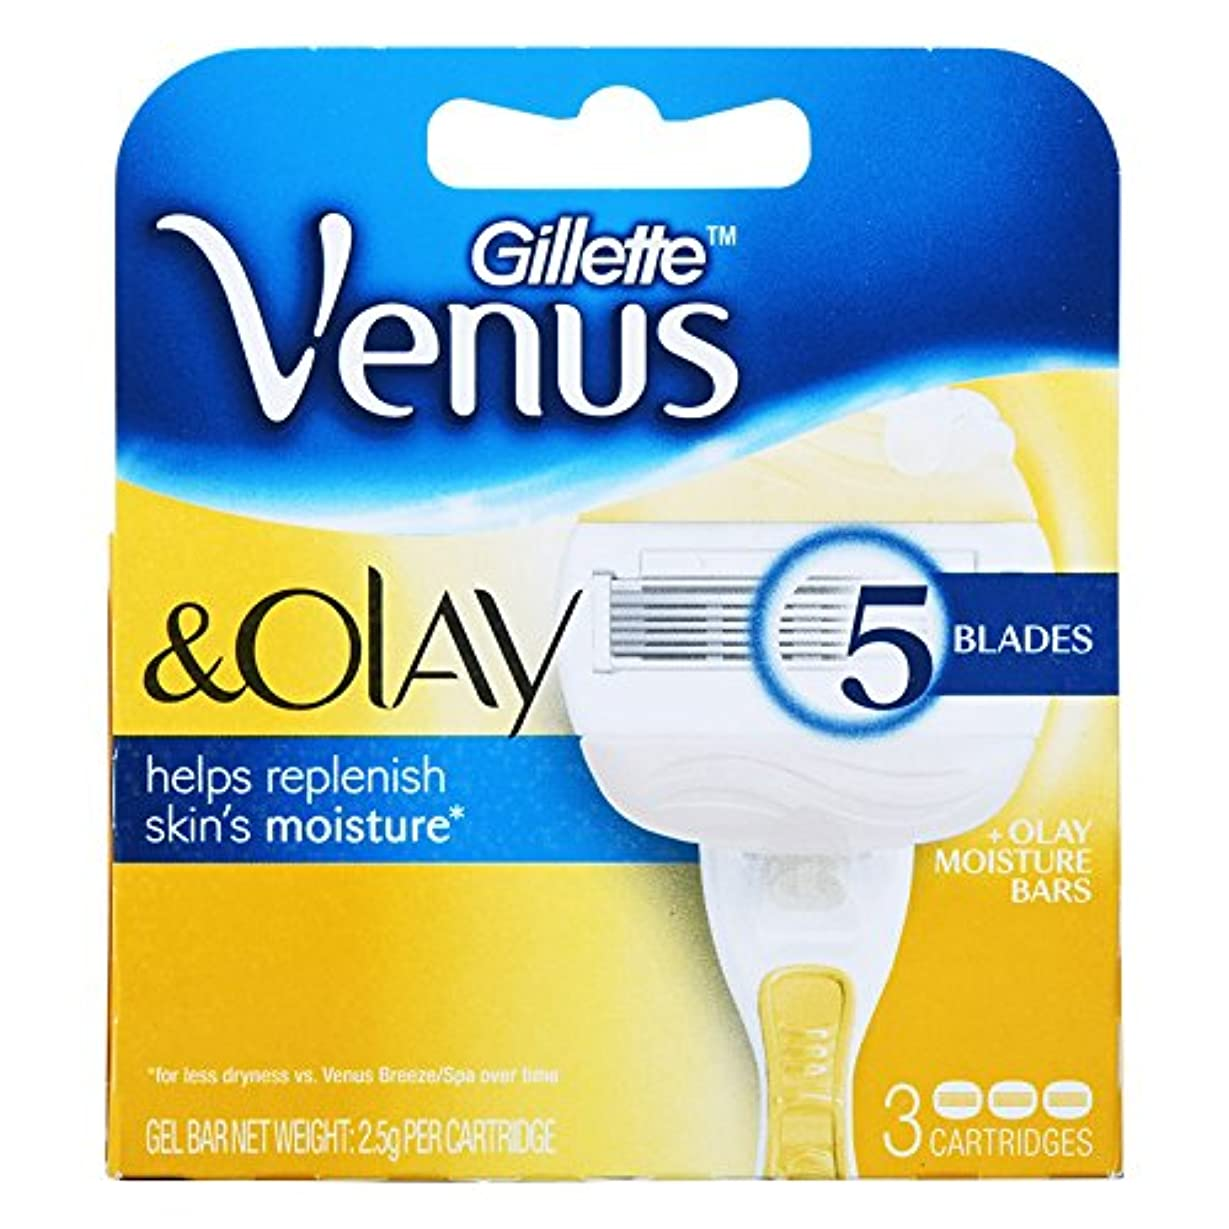 Gillette Venus Olay Razor Blades カートリッジブレード 3 Pcs [並行輸入品]